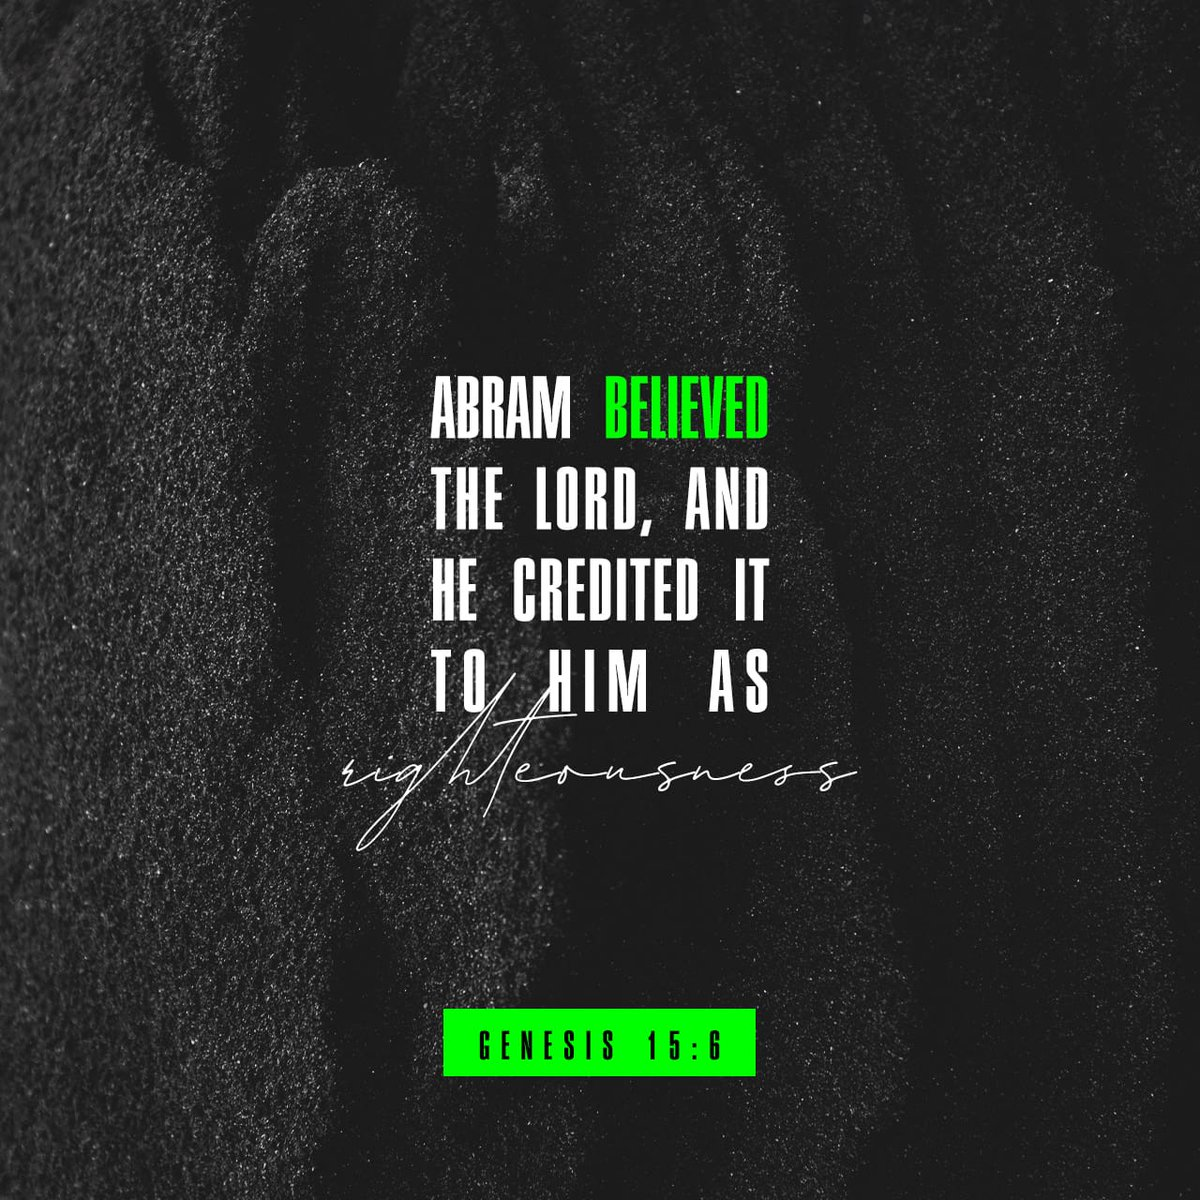 Genesis 15.6 (KJV)Amen. #God #Jesus #faith #righteousness #apostolicsyr #maxjonesministries #syracuse